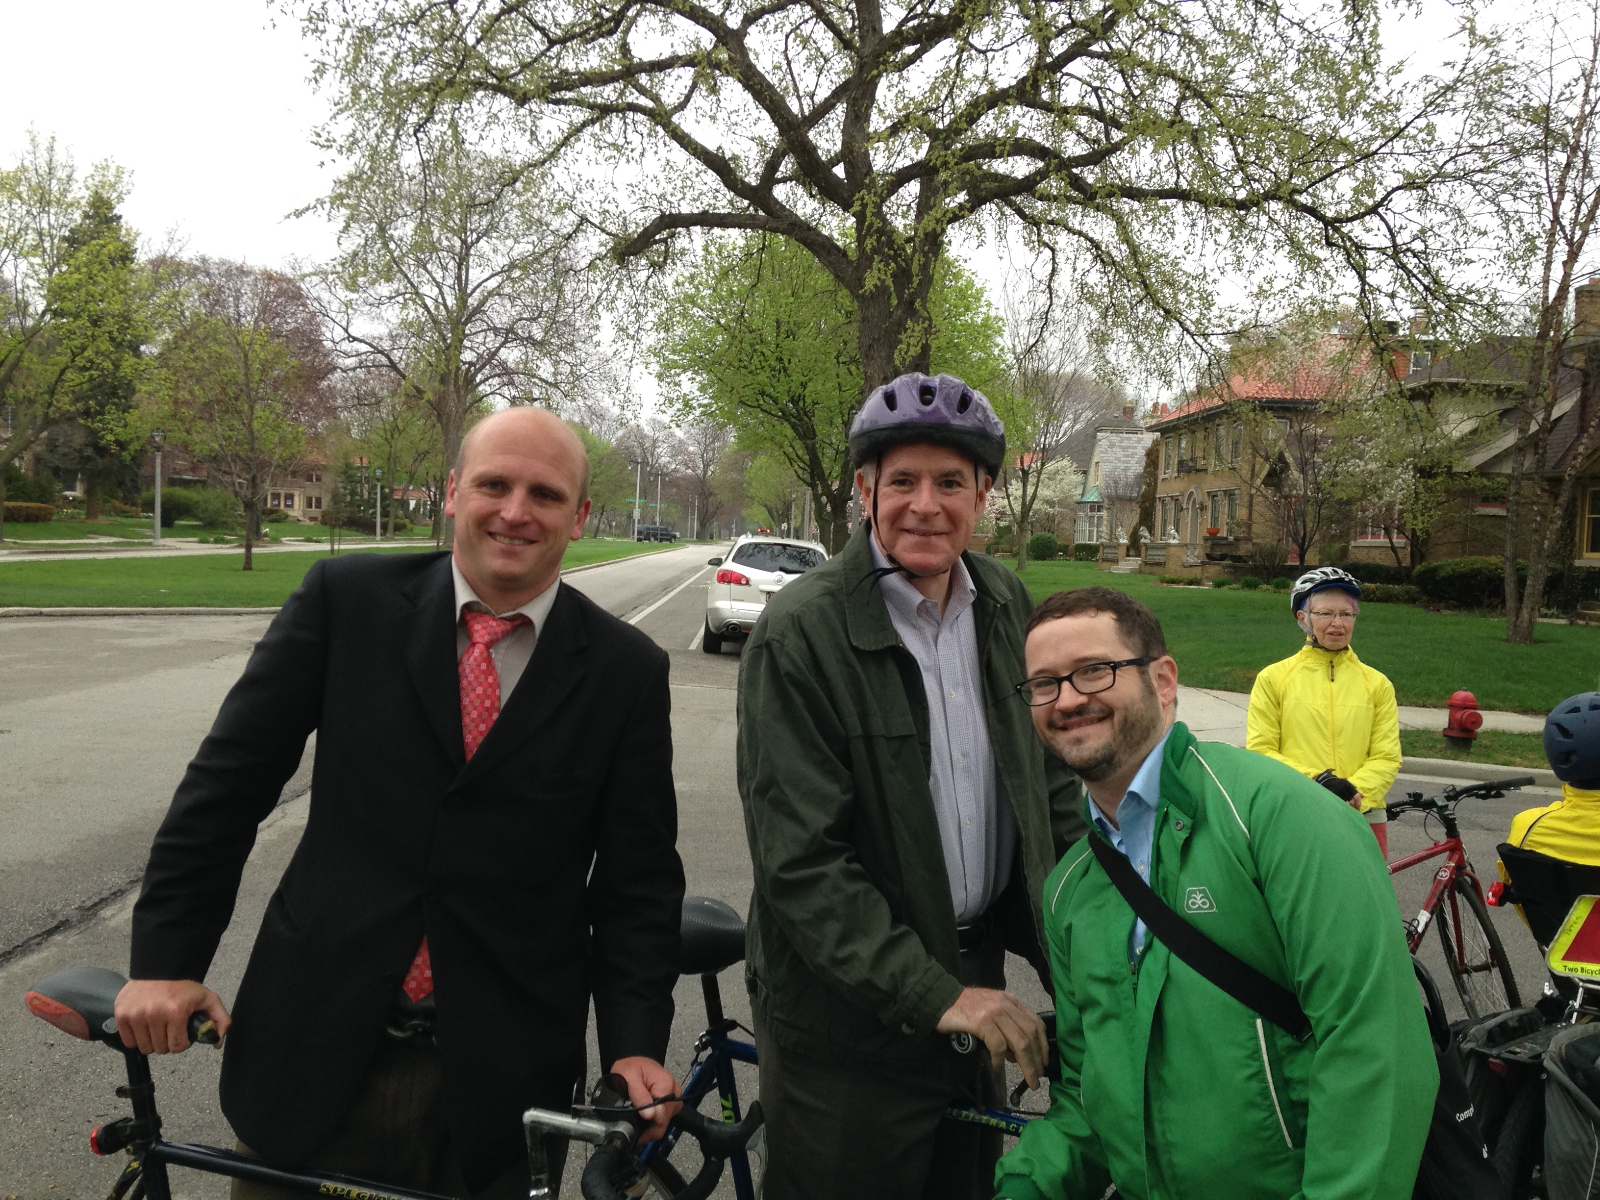 Ald. Nik Kovac, Mayor Tom Barrett, and Dave Steele.